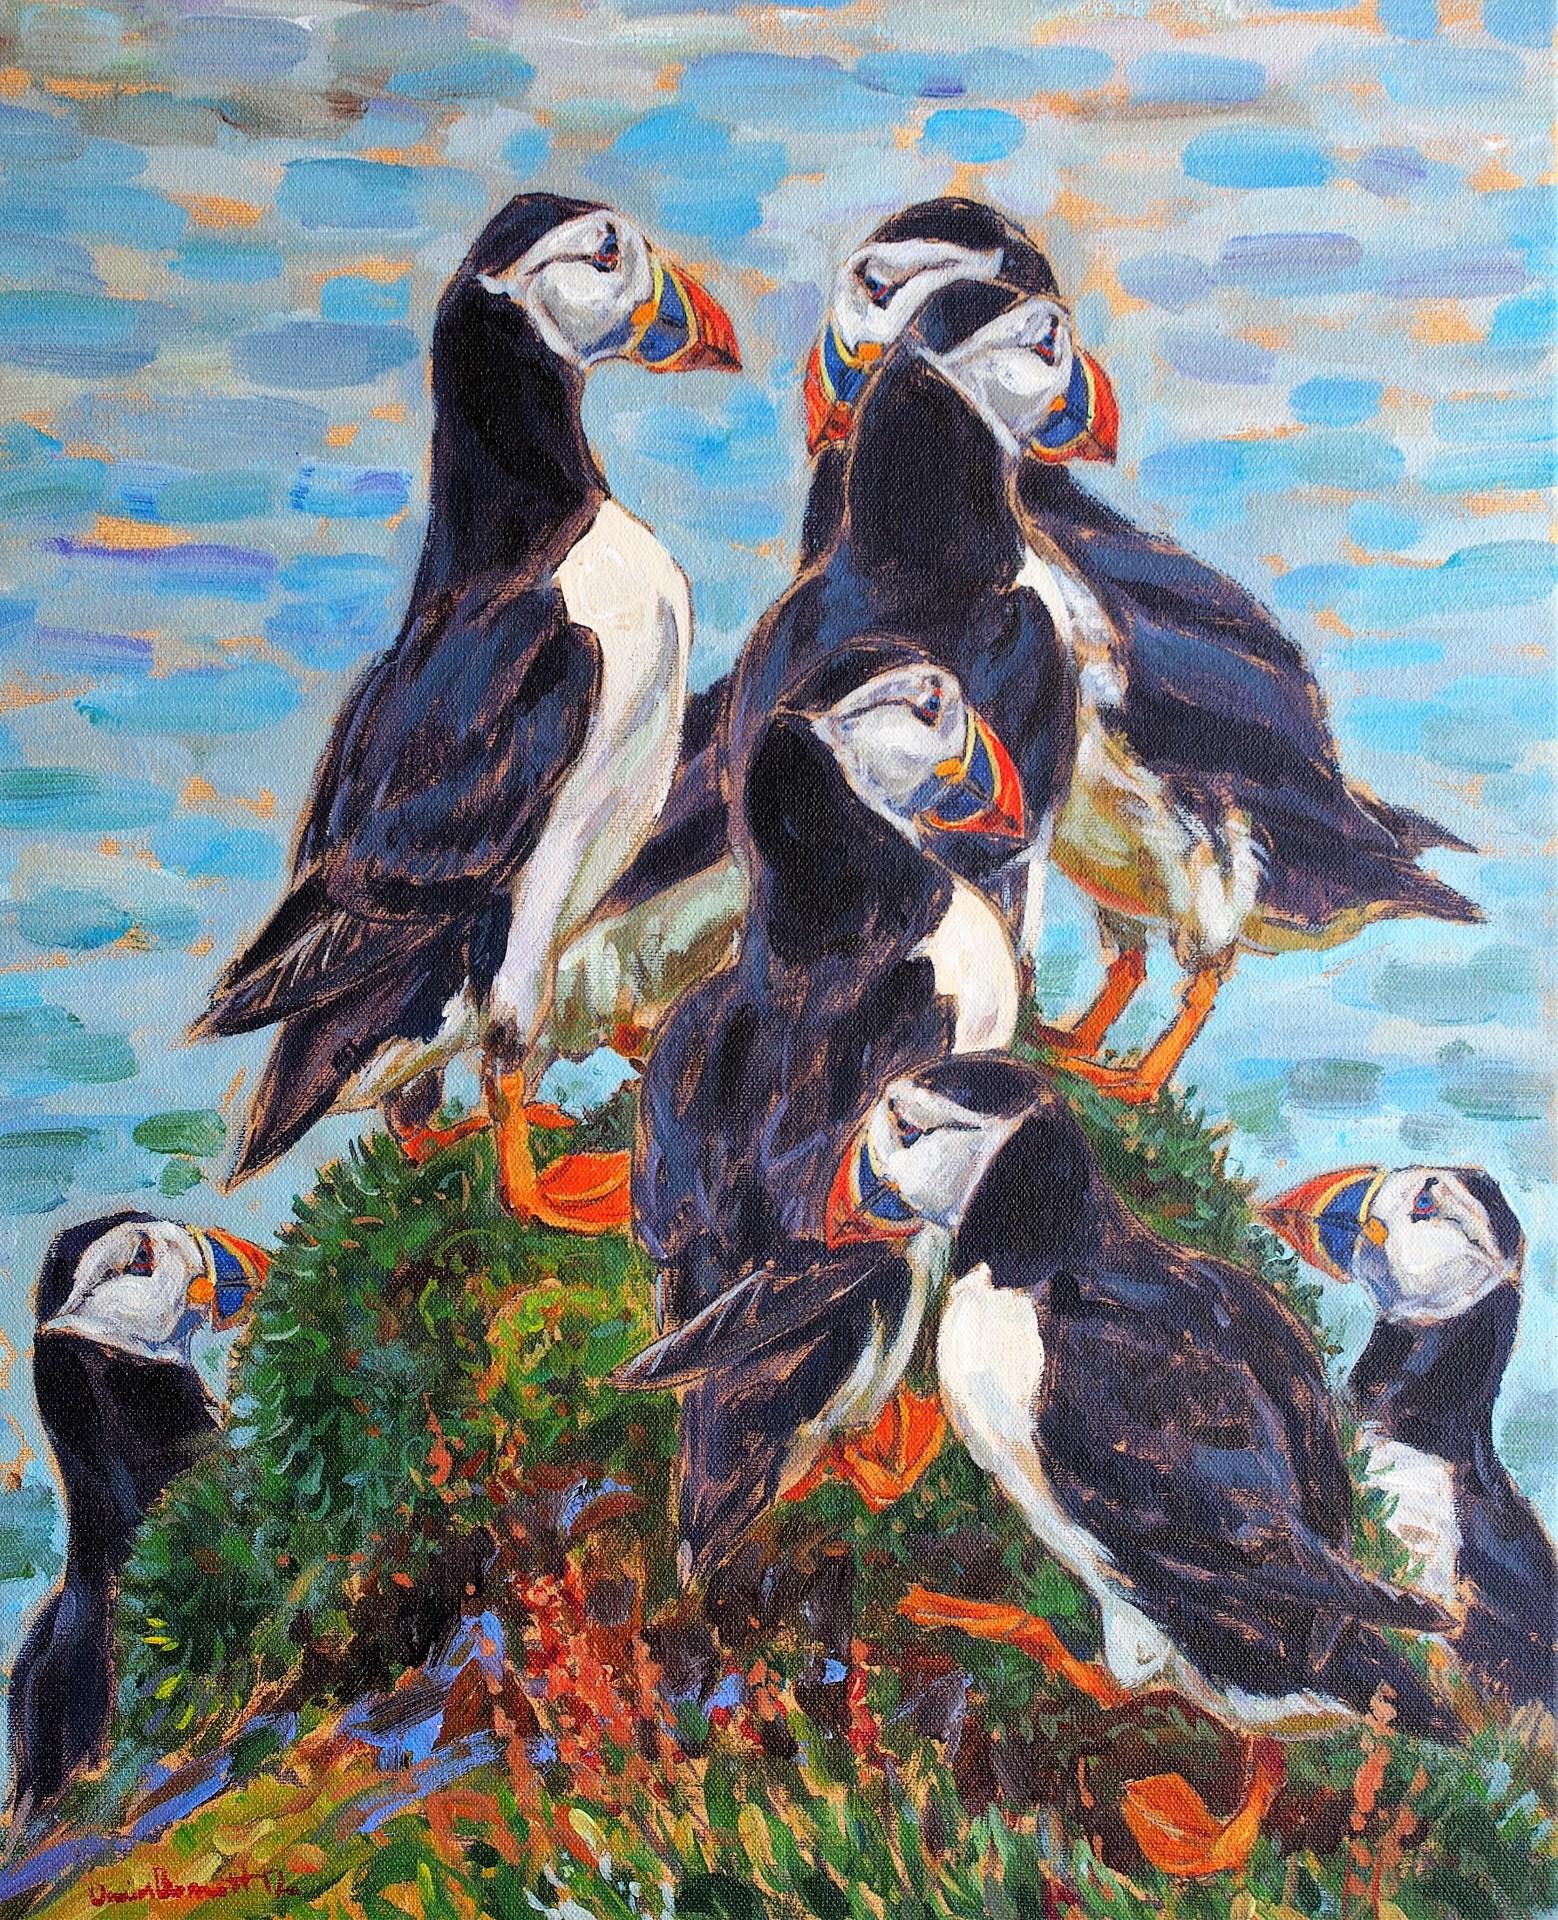 Puffin Knoll, Treshnish Isles